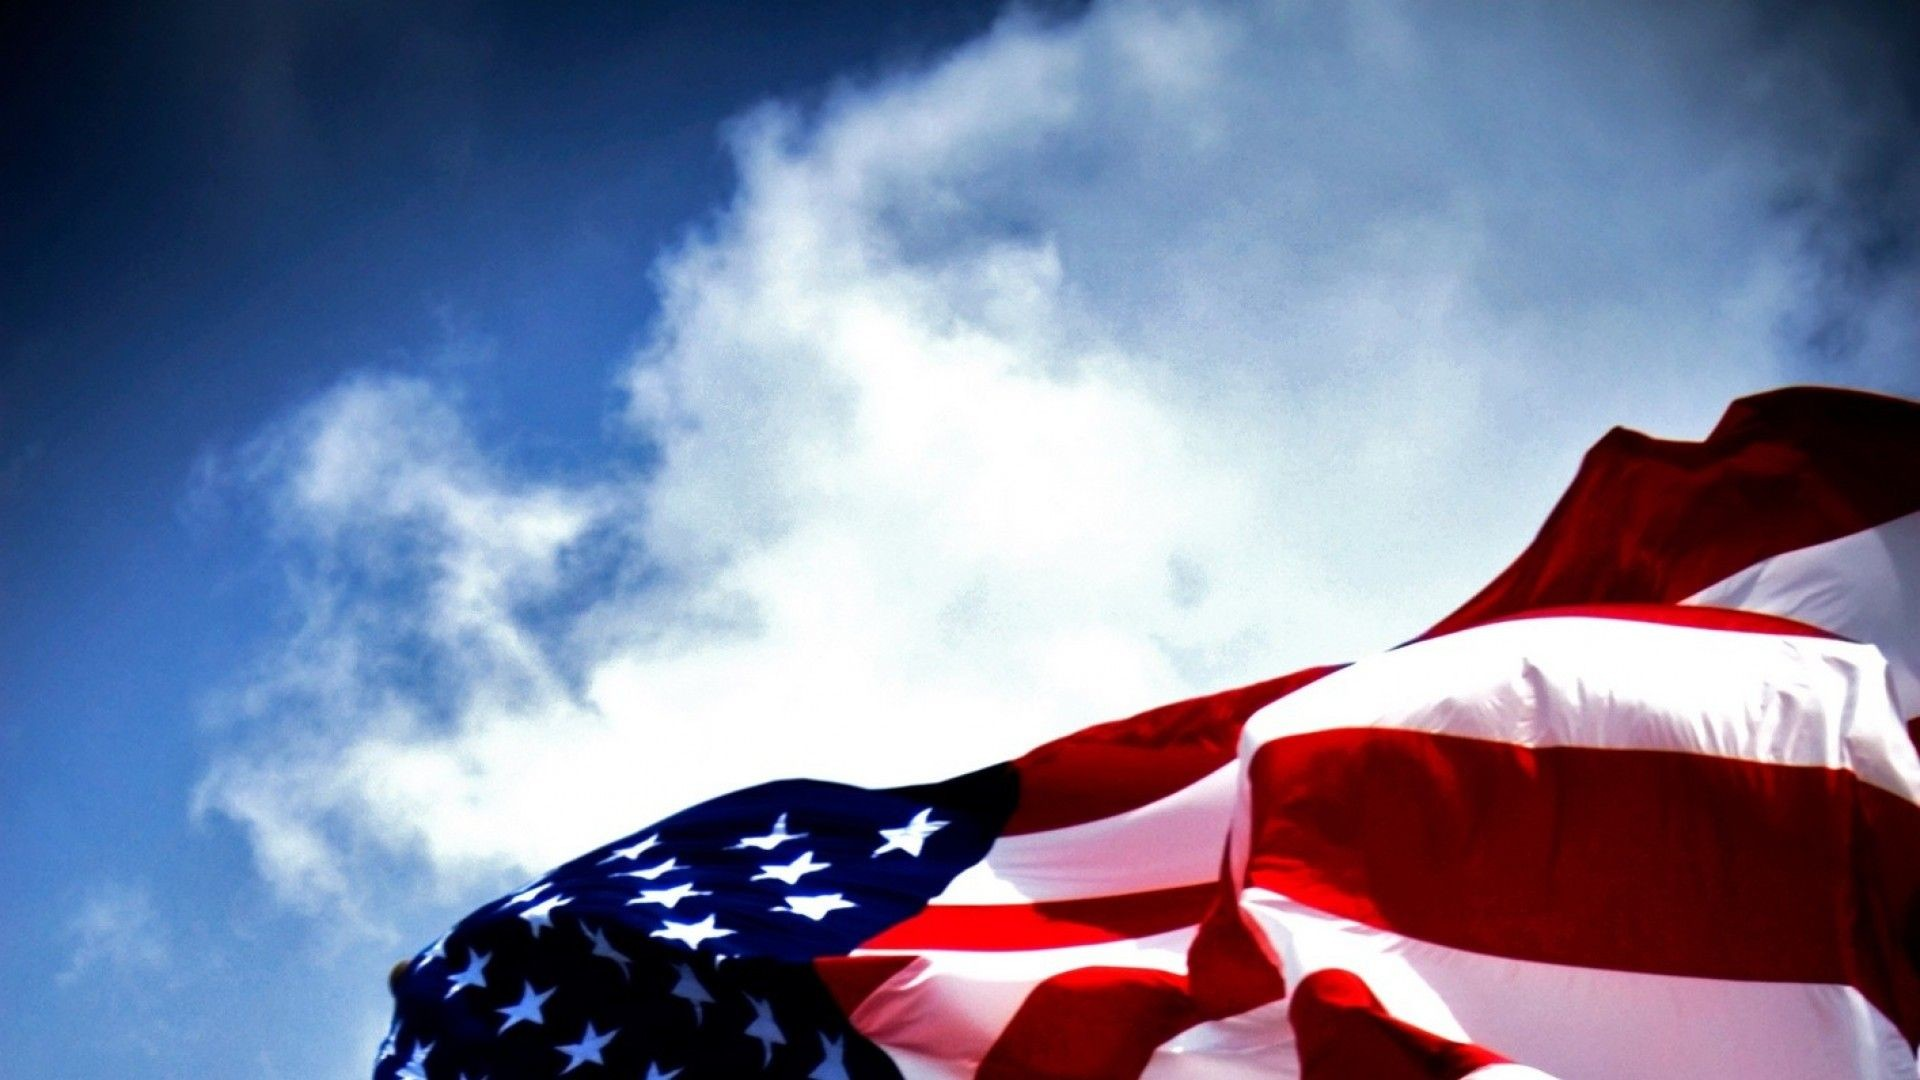 American Flag iphone Free Download Desktop Wallpaper.